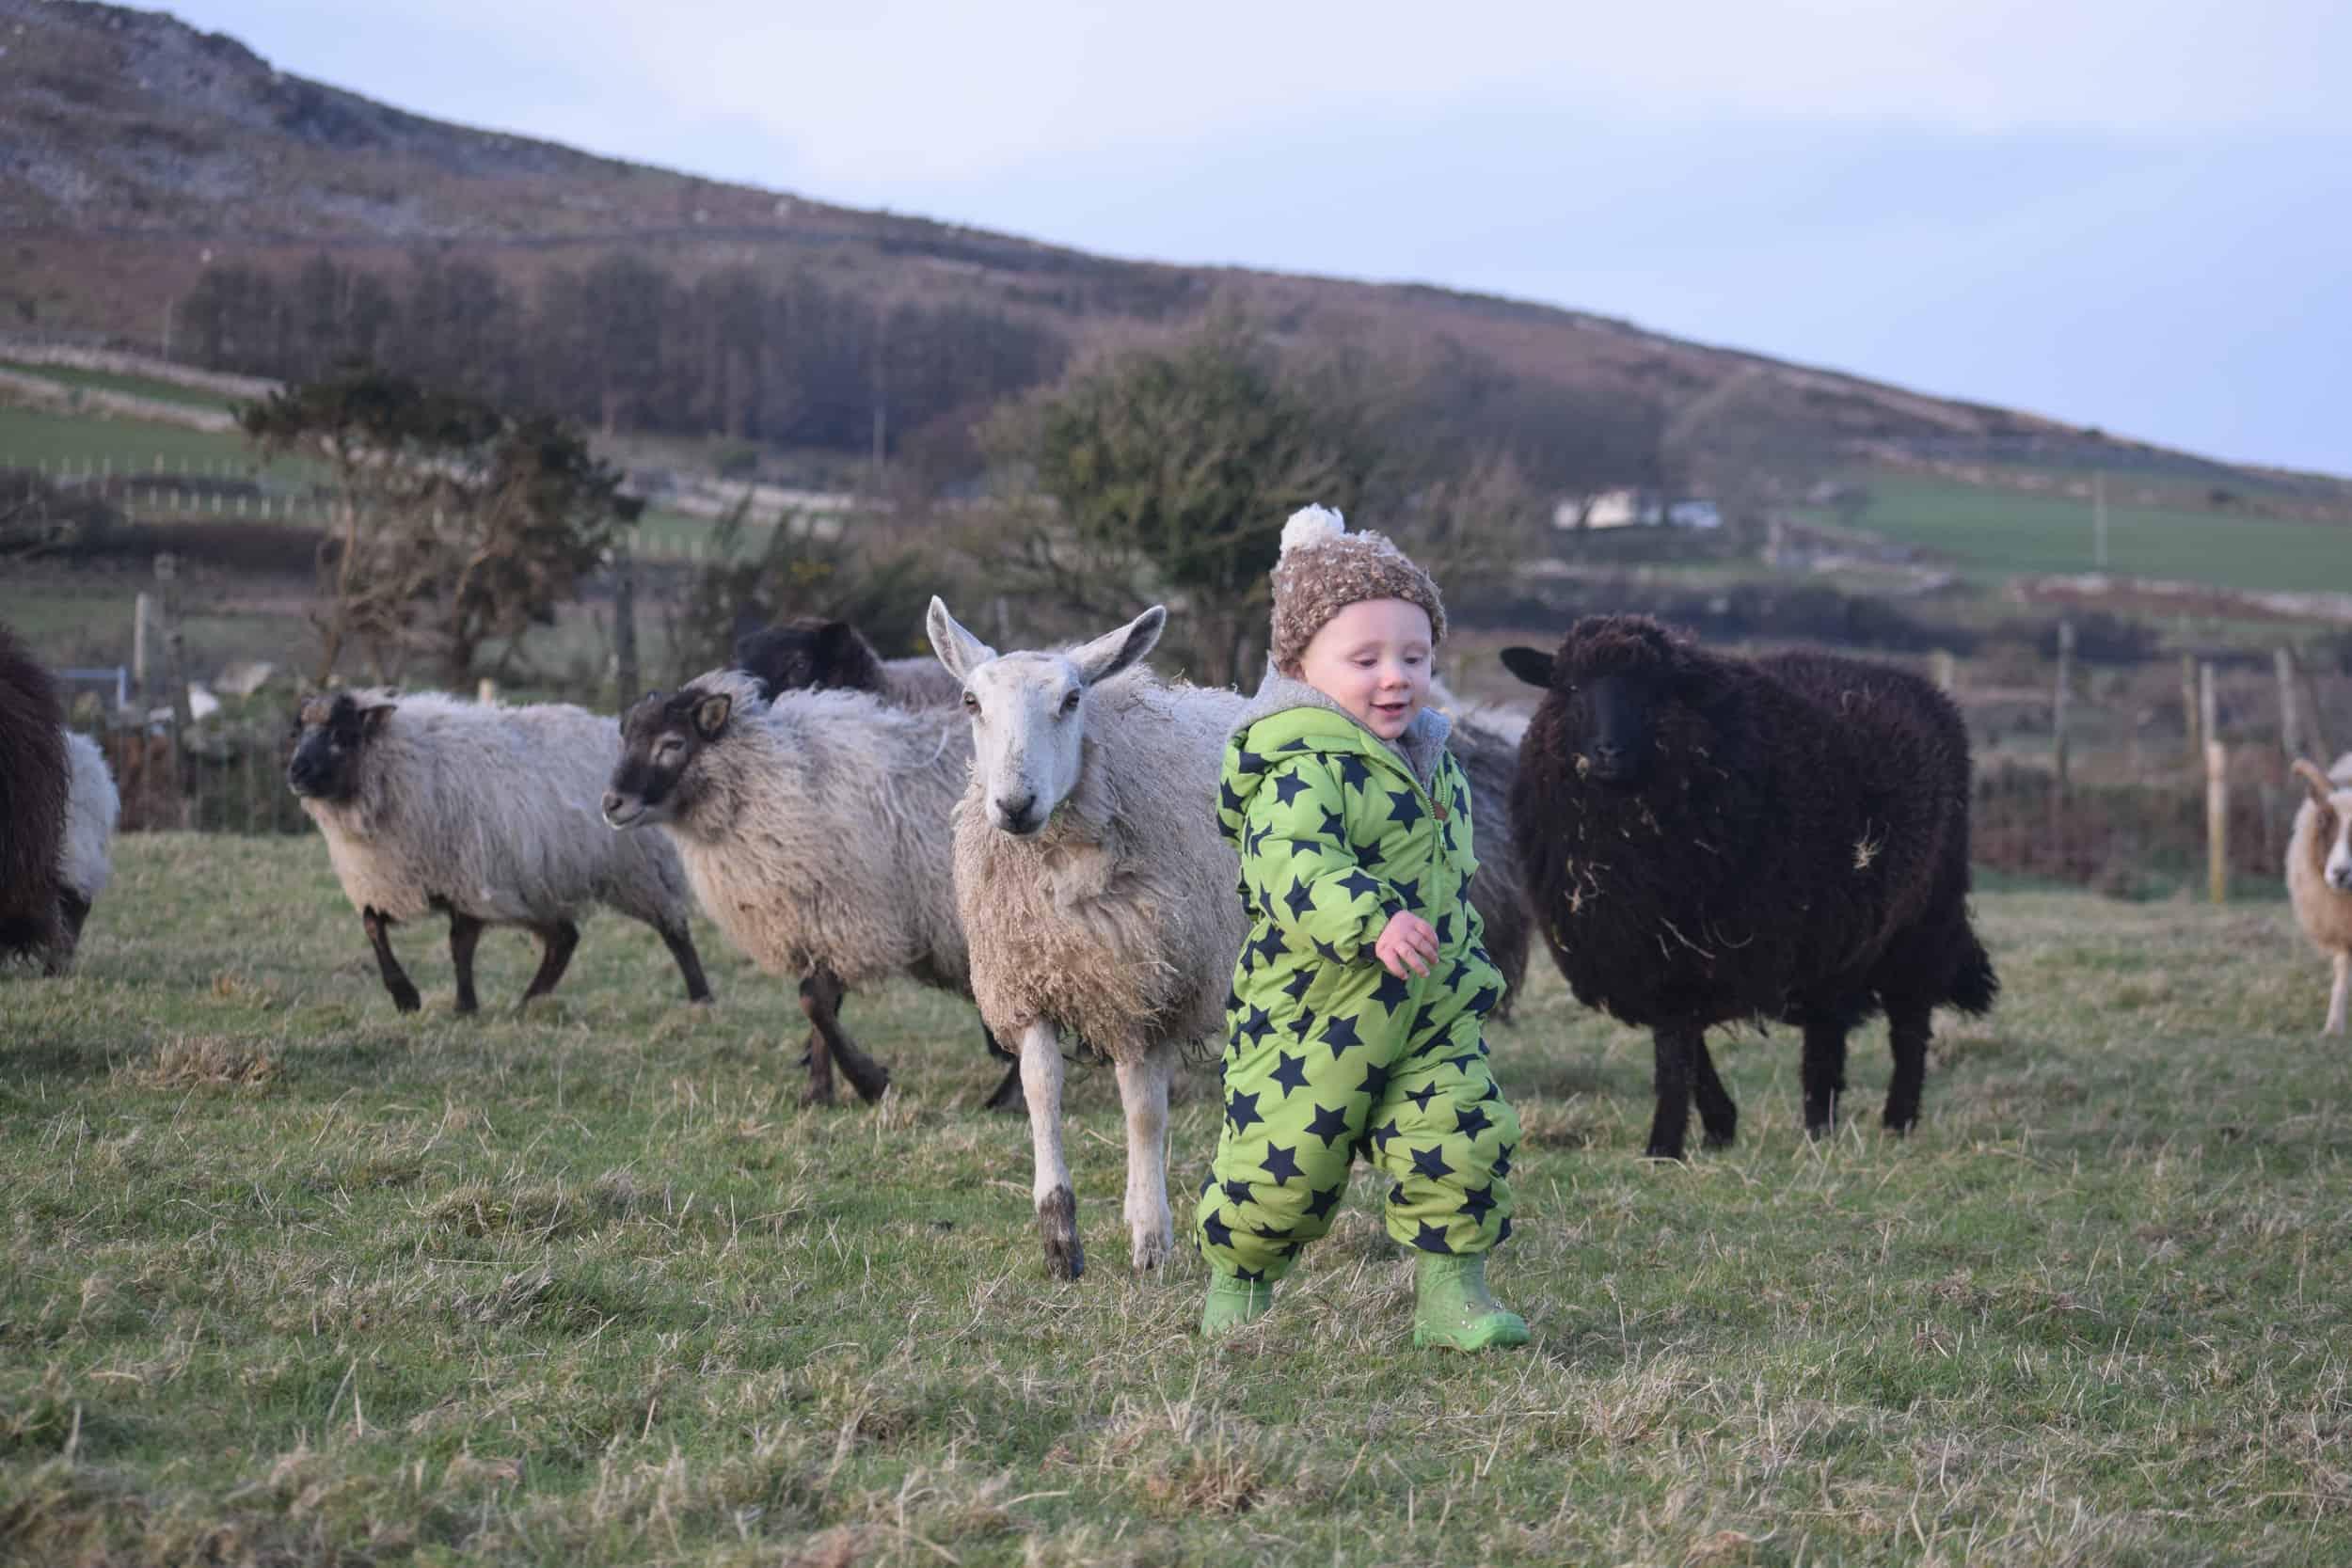 Lily ollie bfl blueface leicester sheep ewe lamb pet bottle baby lamb